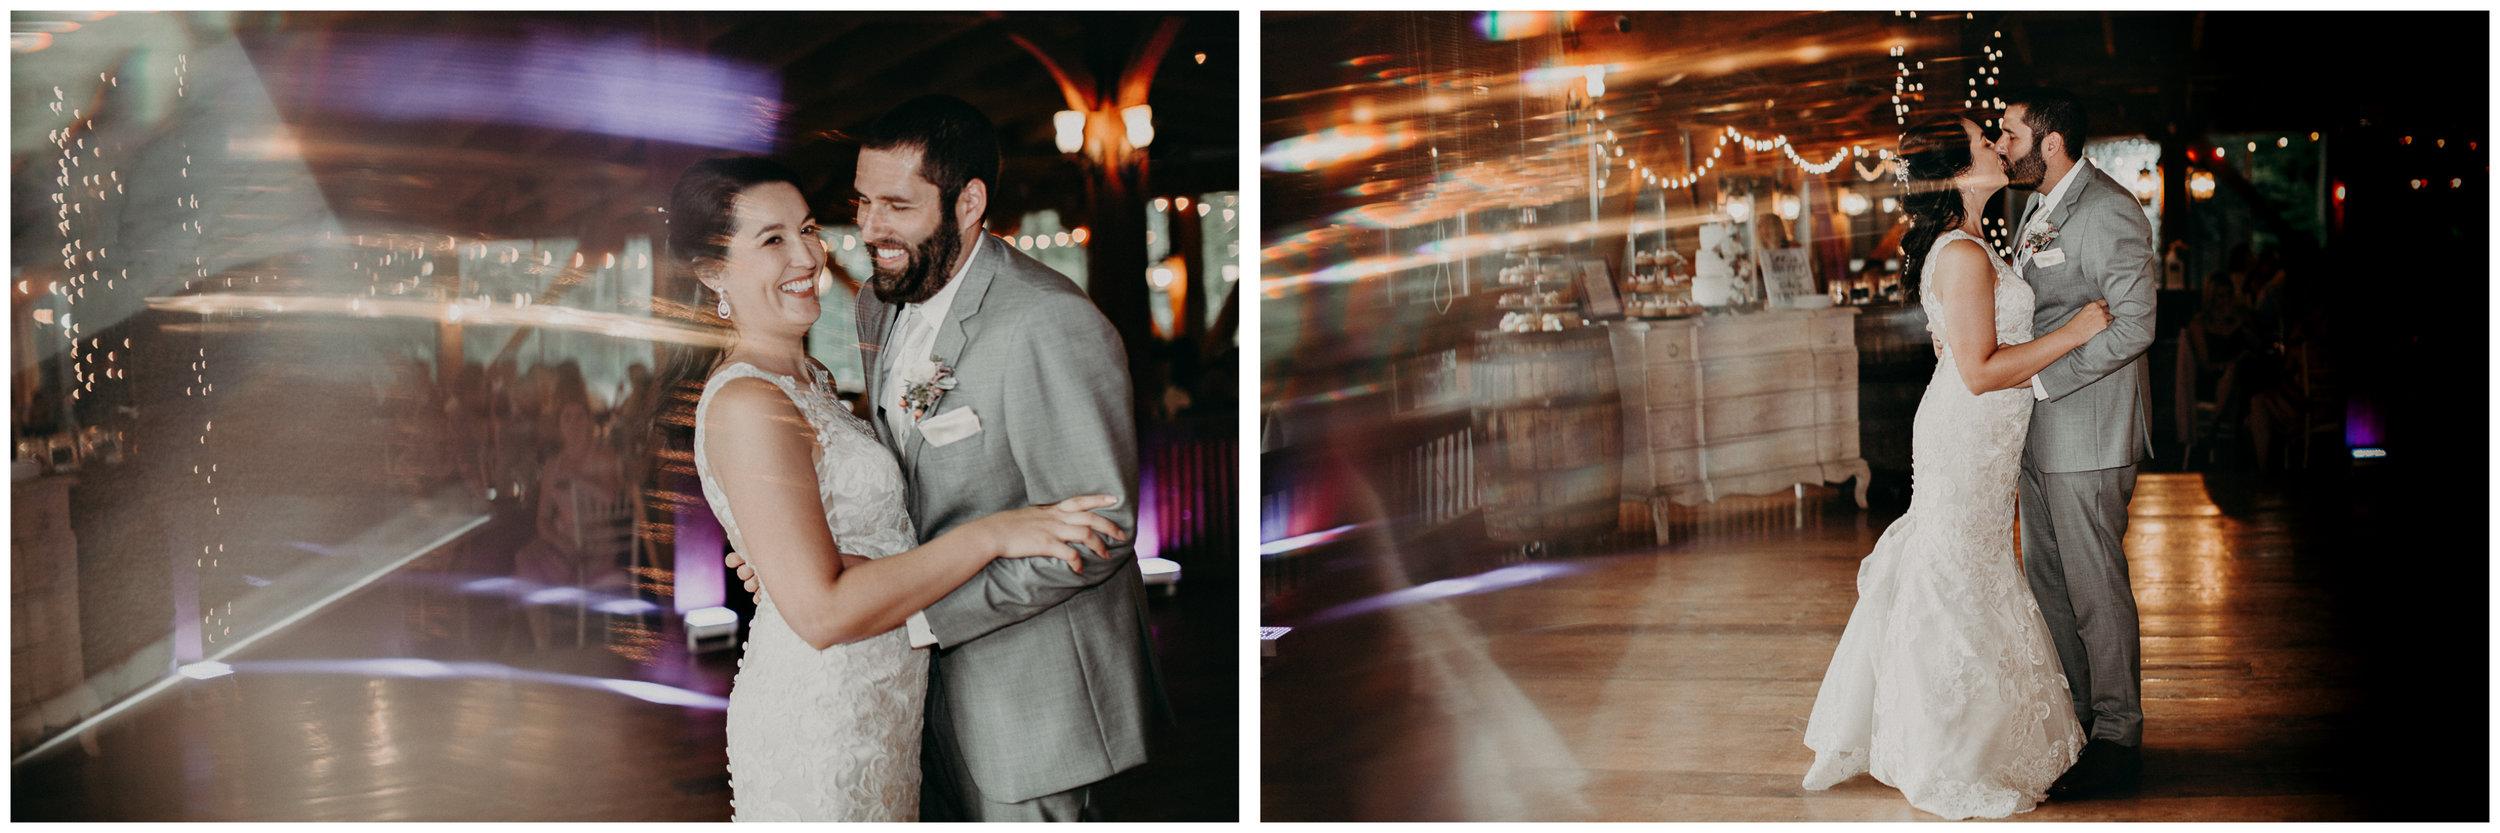 82  wedding day portraits bride and groom atlanta - georgia - ga wedding details - photographer .jpg